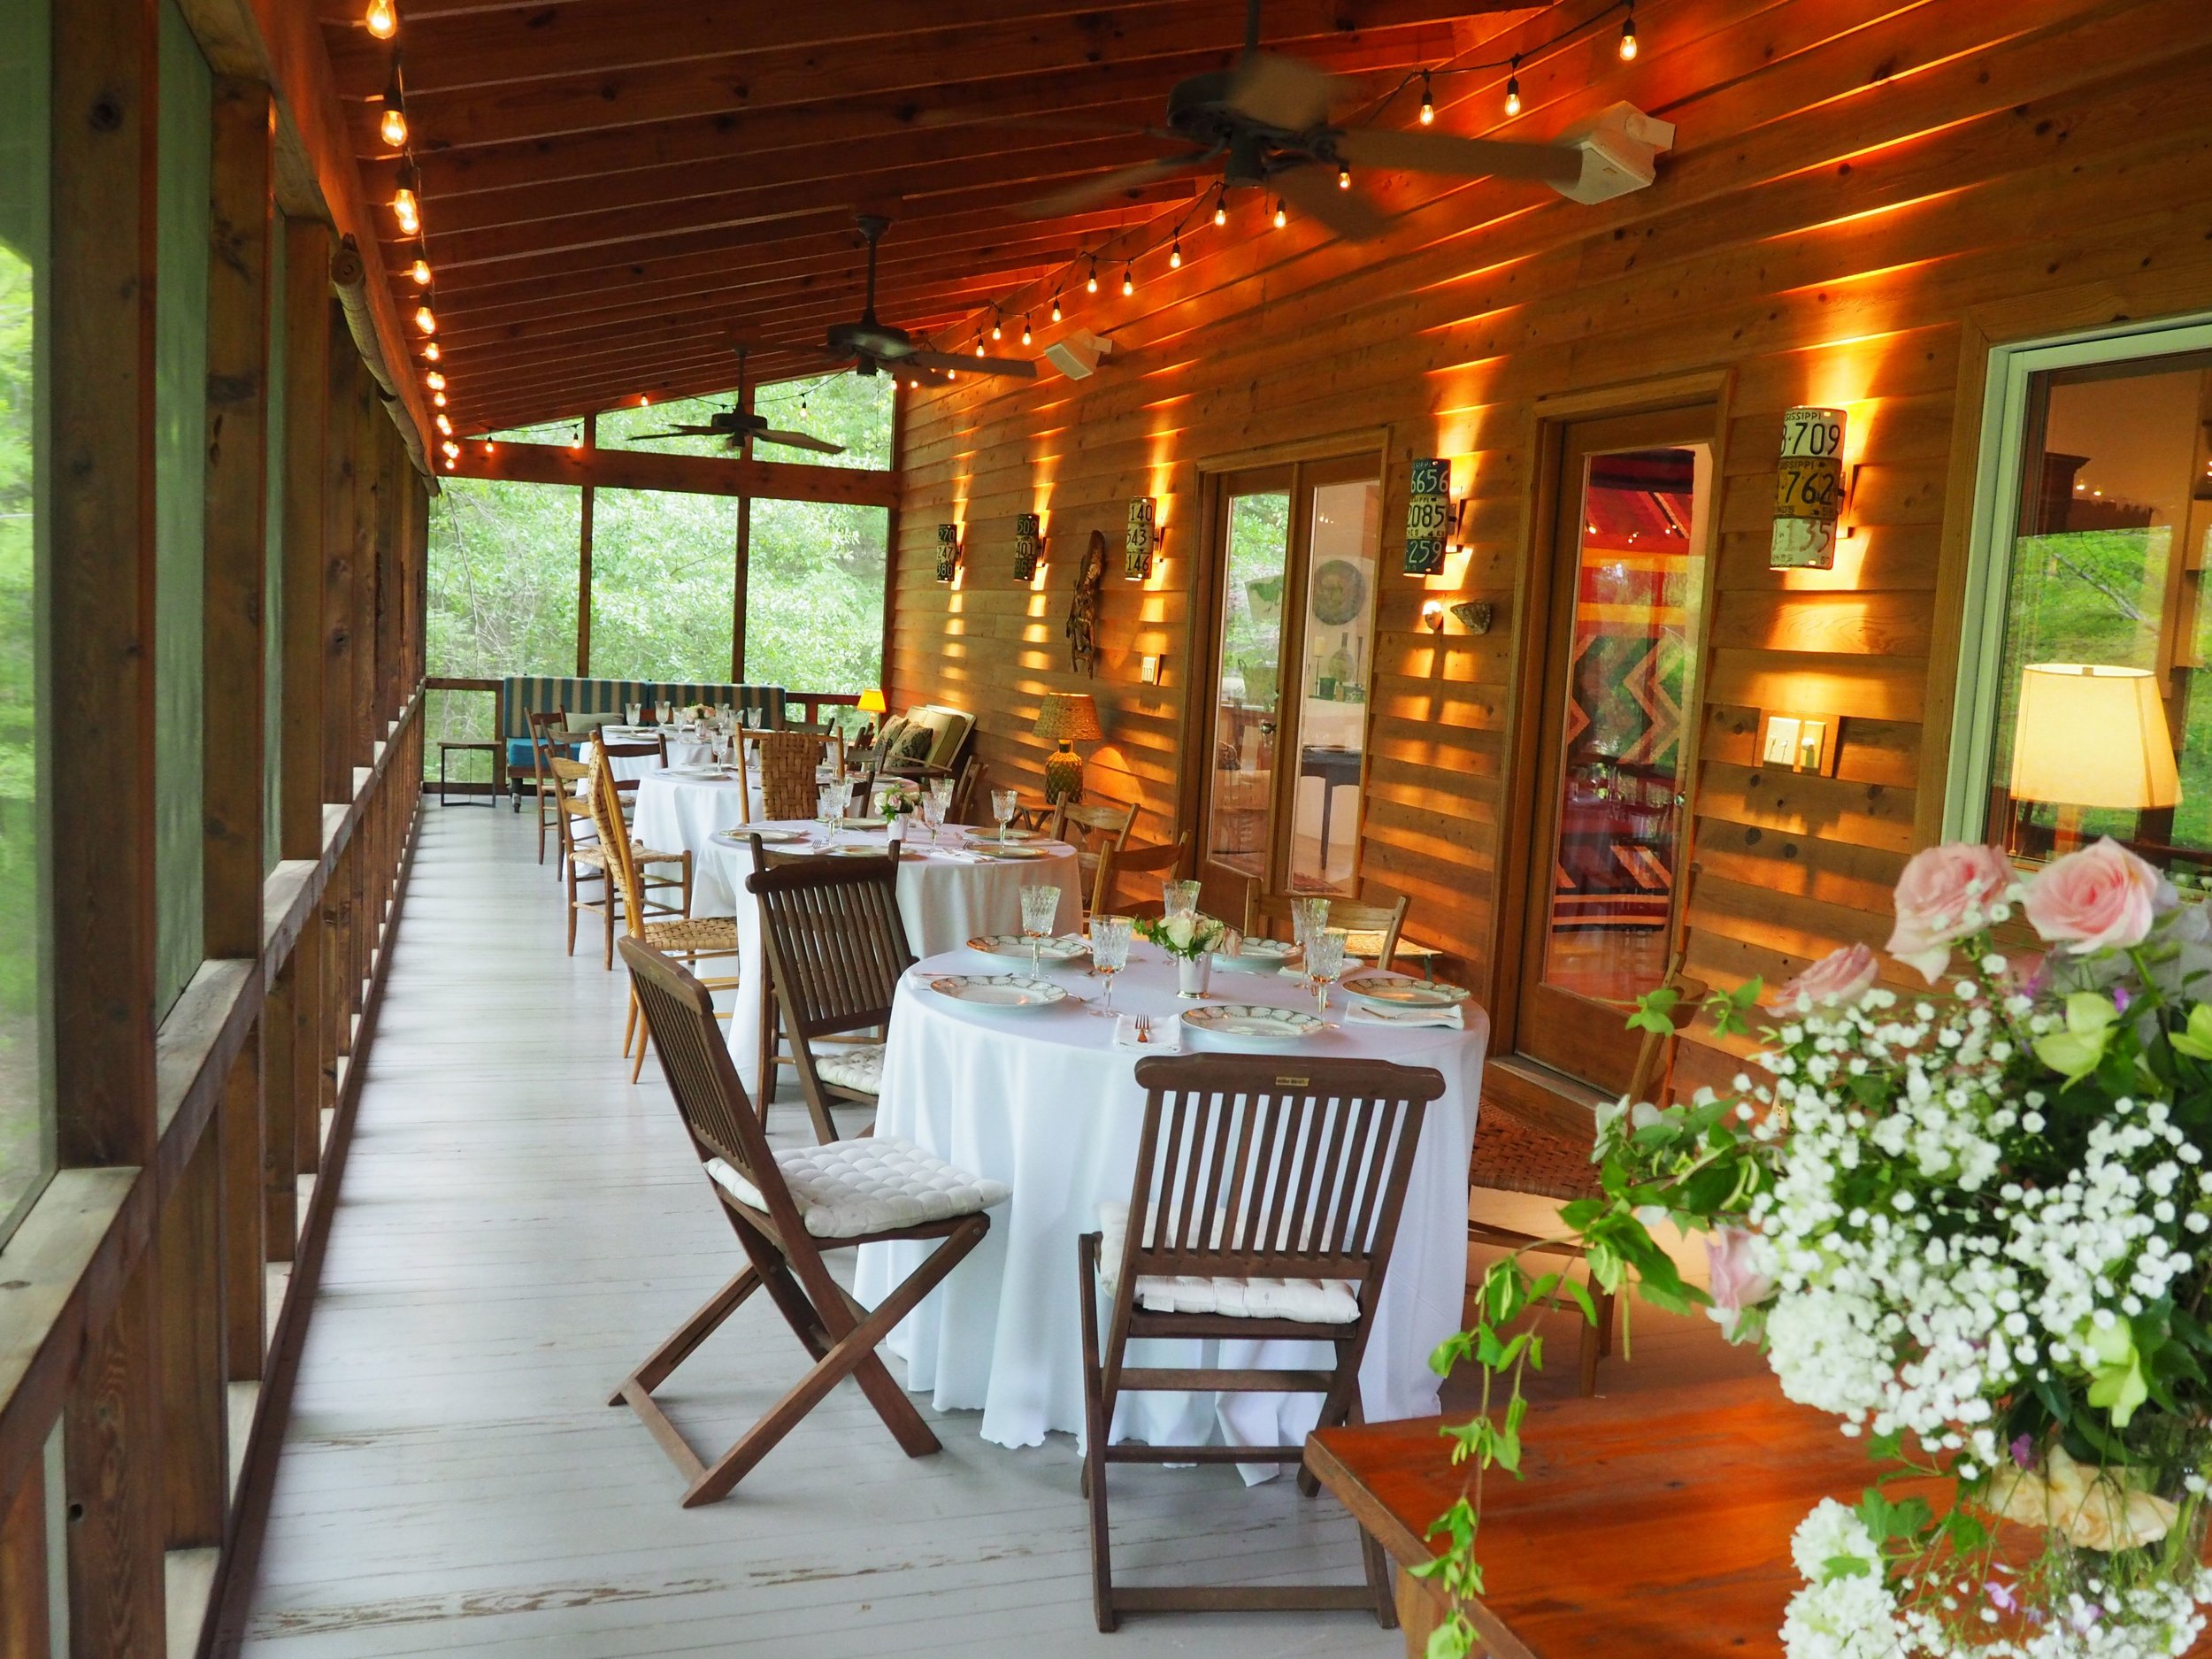 porch dinner 2.jpg